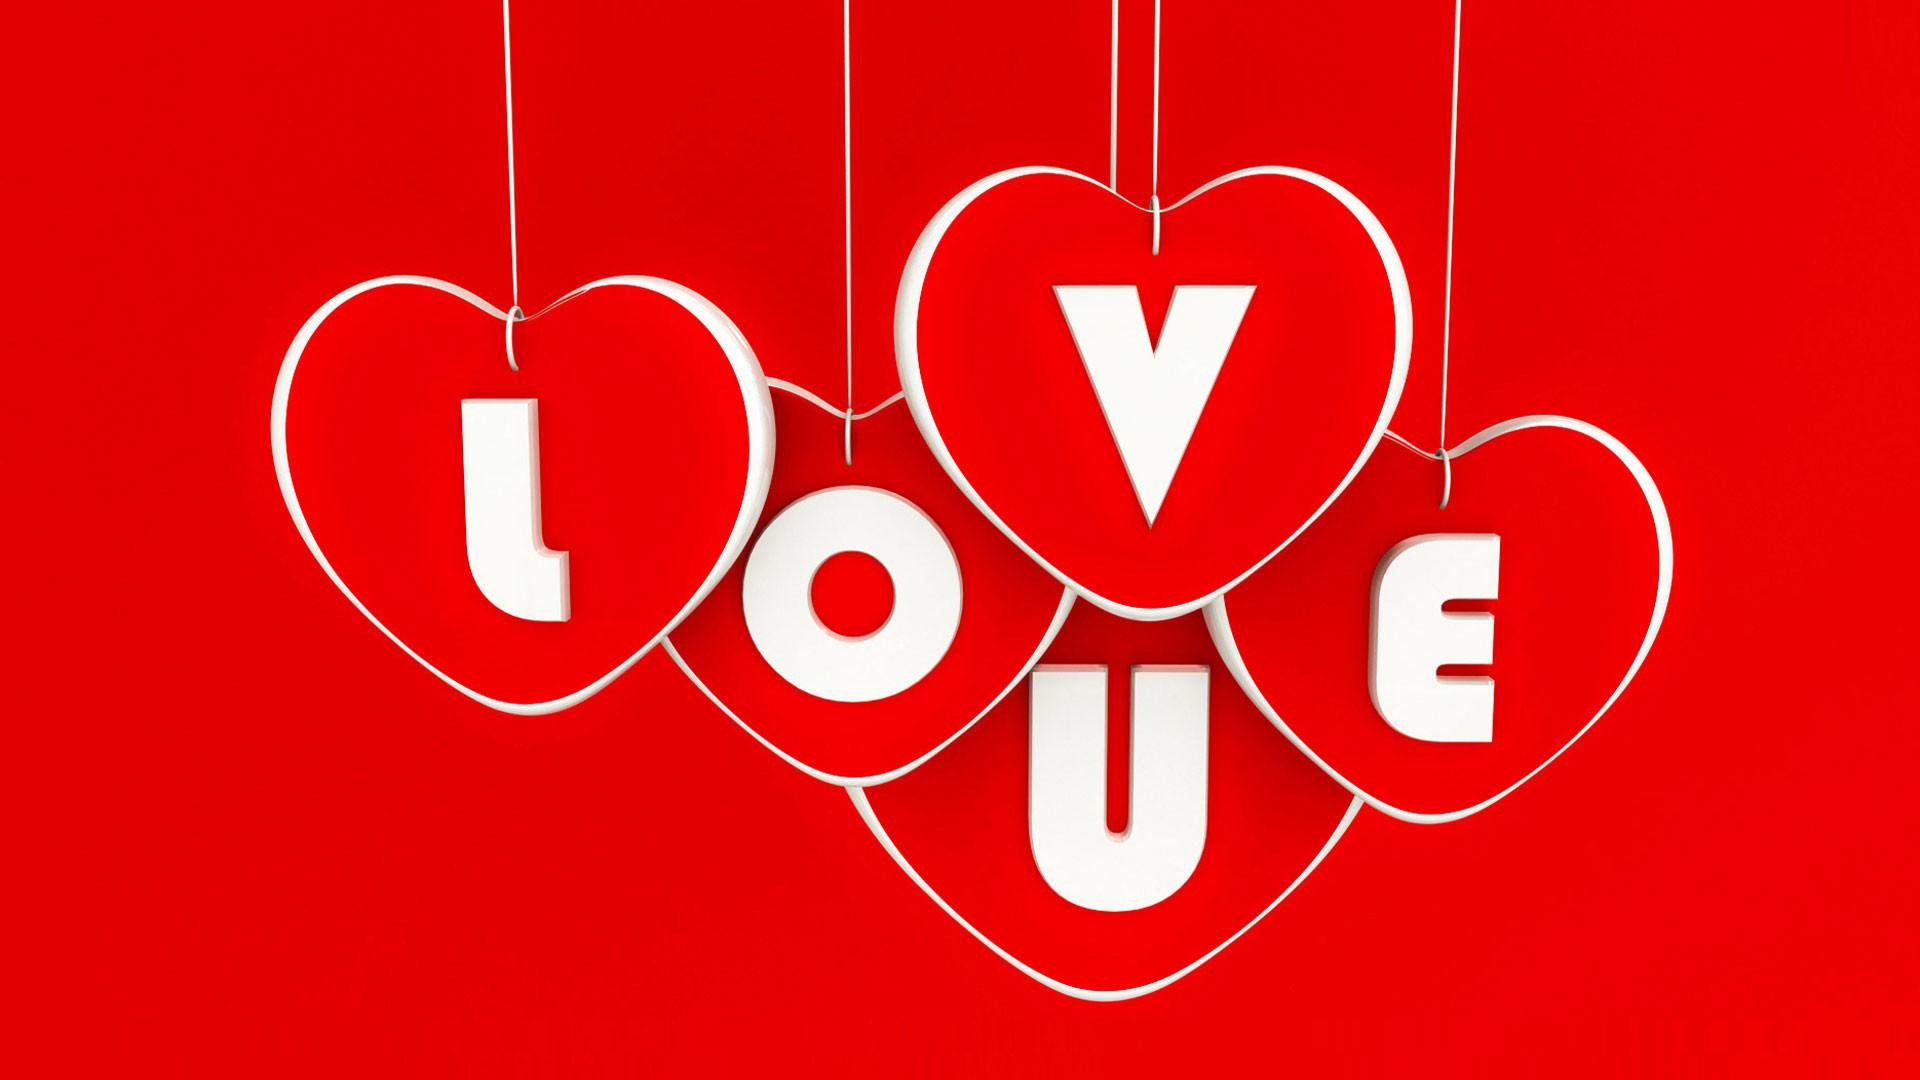 hd pics photos love red text font best i love you desktop background  wallpaper